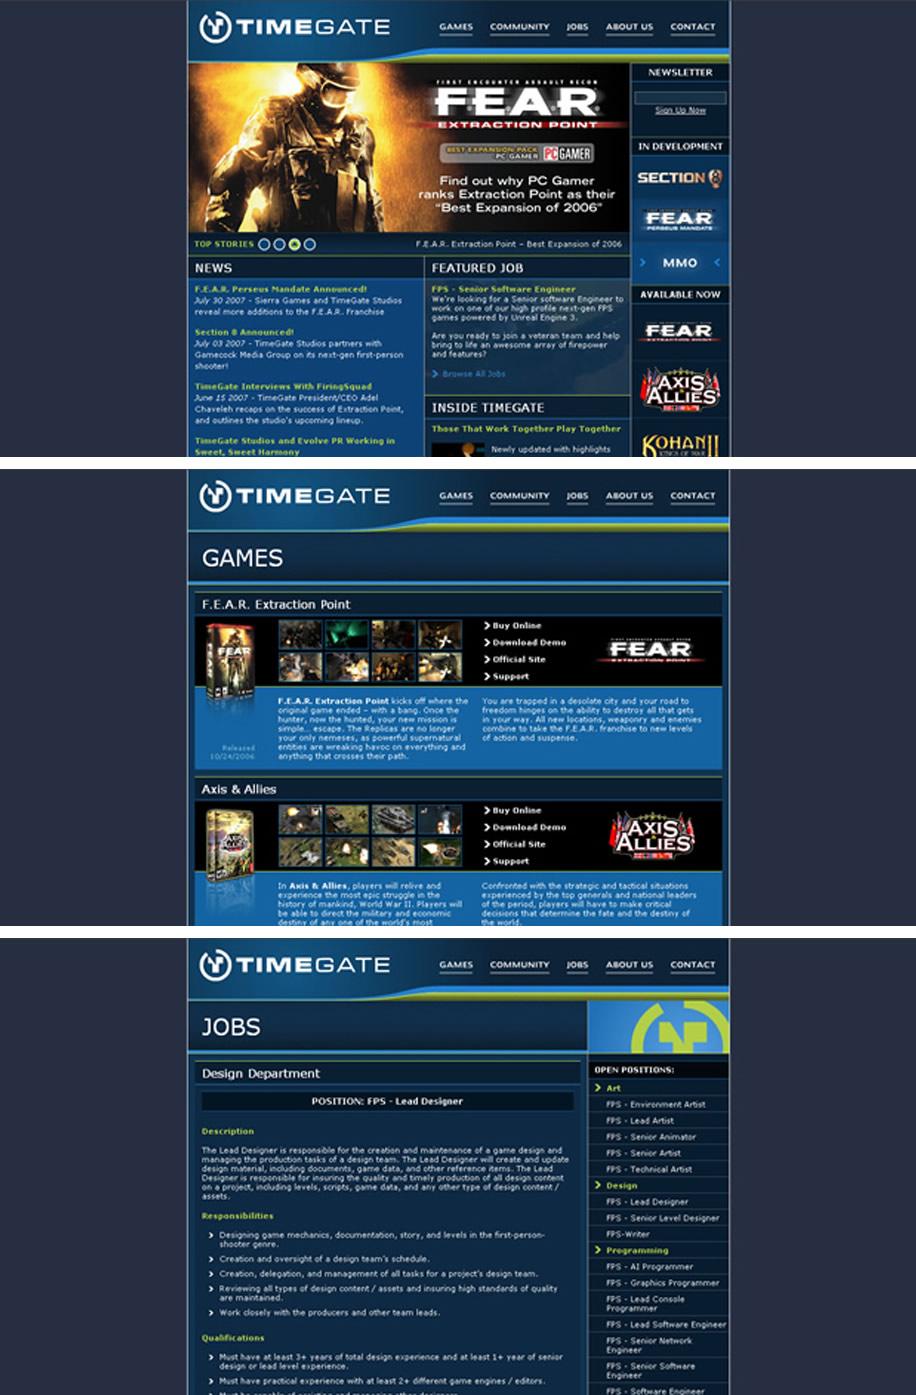 Timegate Studios - Zetenta Interactive Marketing, Digital